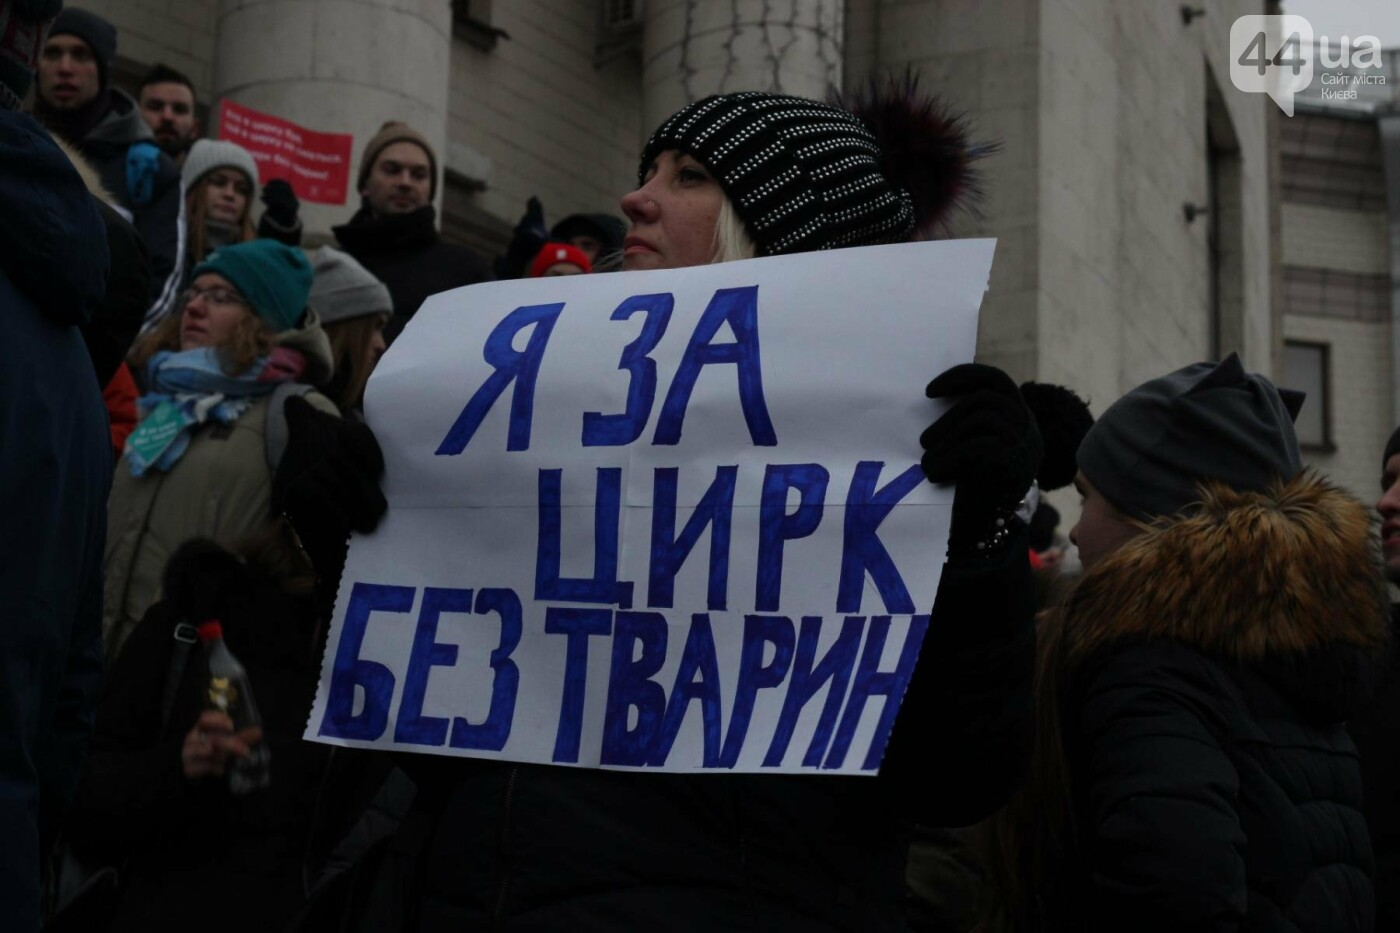 Цирк без животных: как в Киеве прошла акция протеста, фото-15